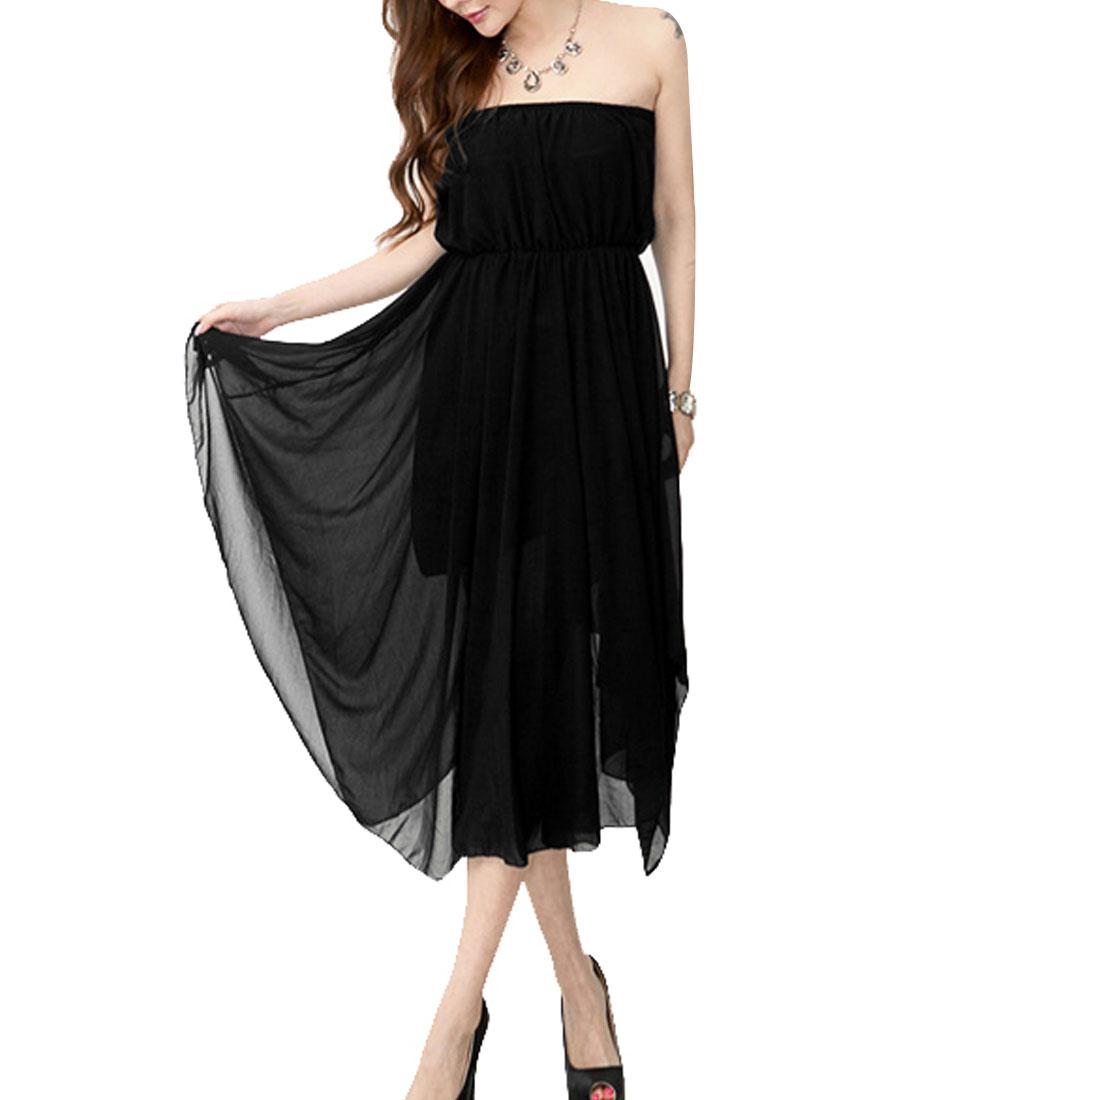 Women Sleeveless Elastic Waist Irregular Hem Tube Dress Black XS